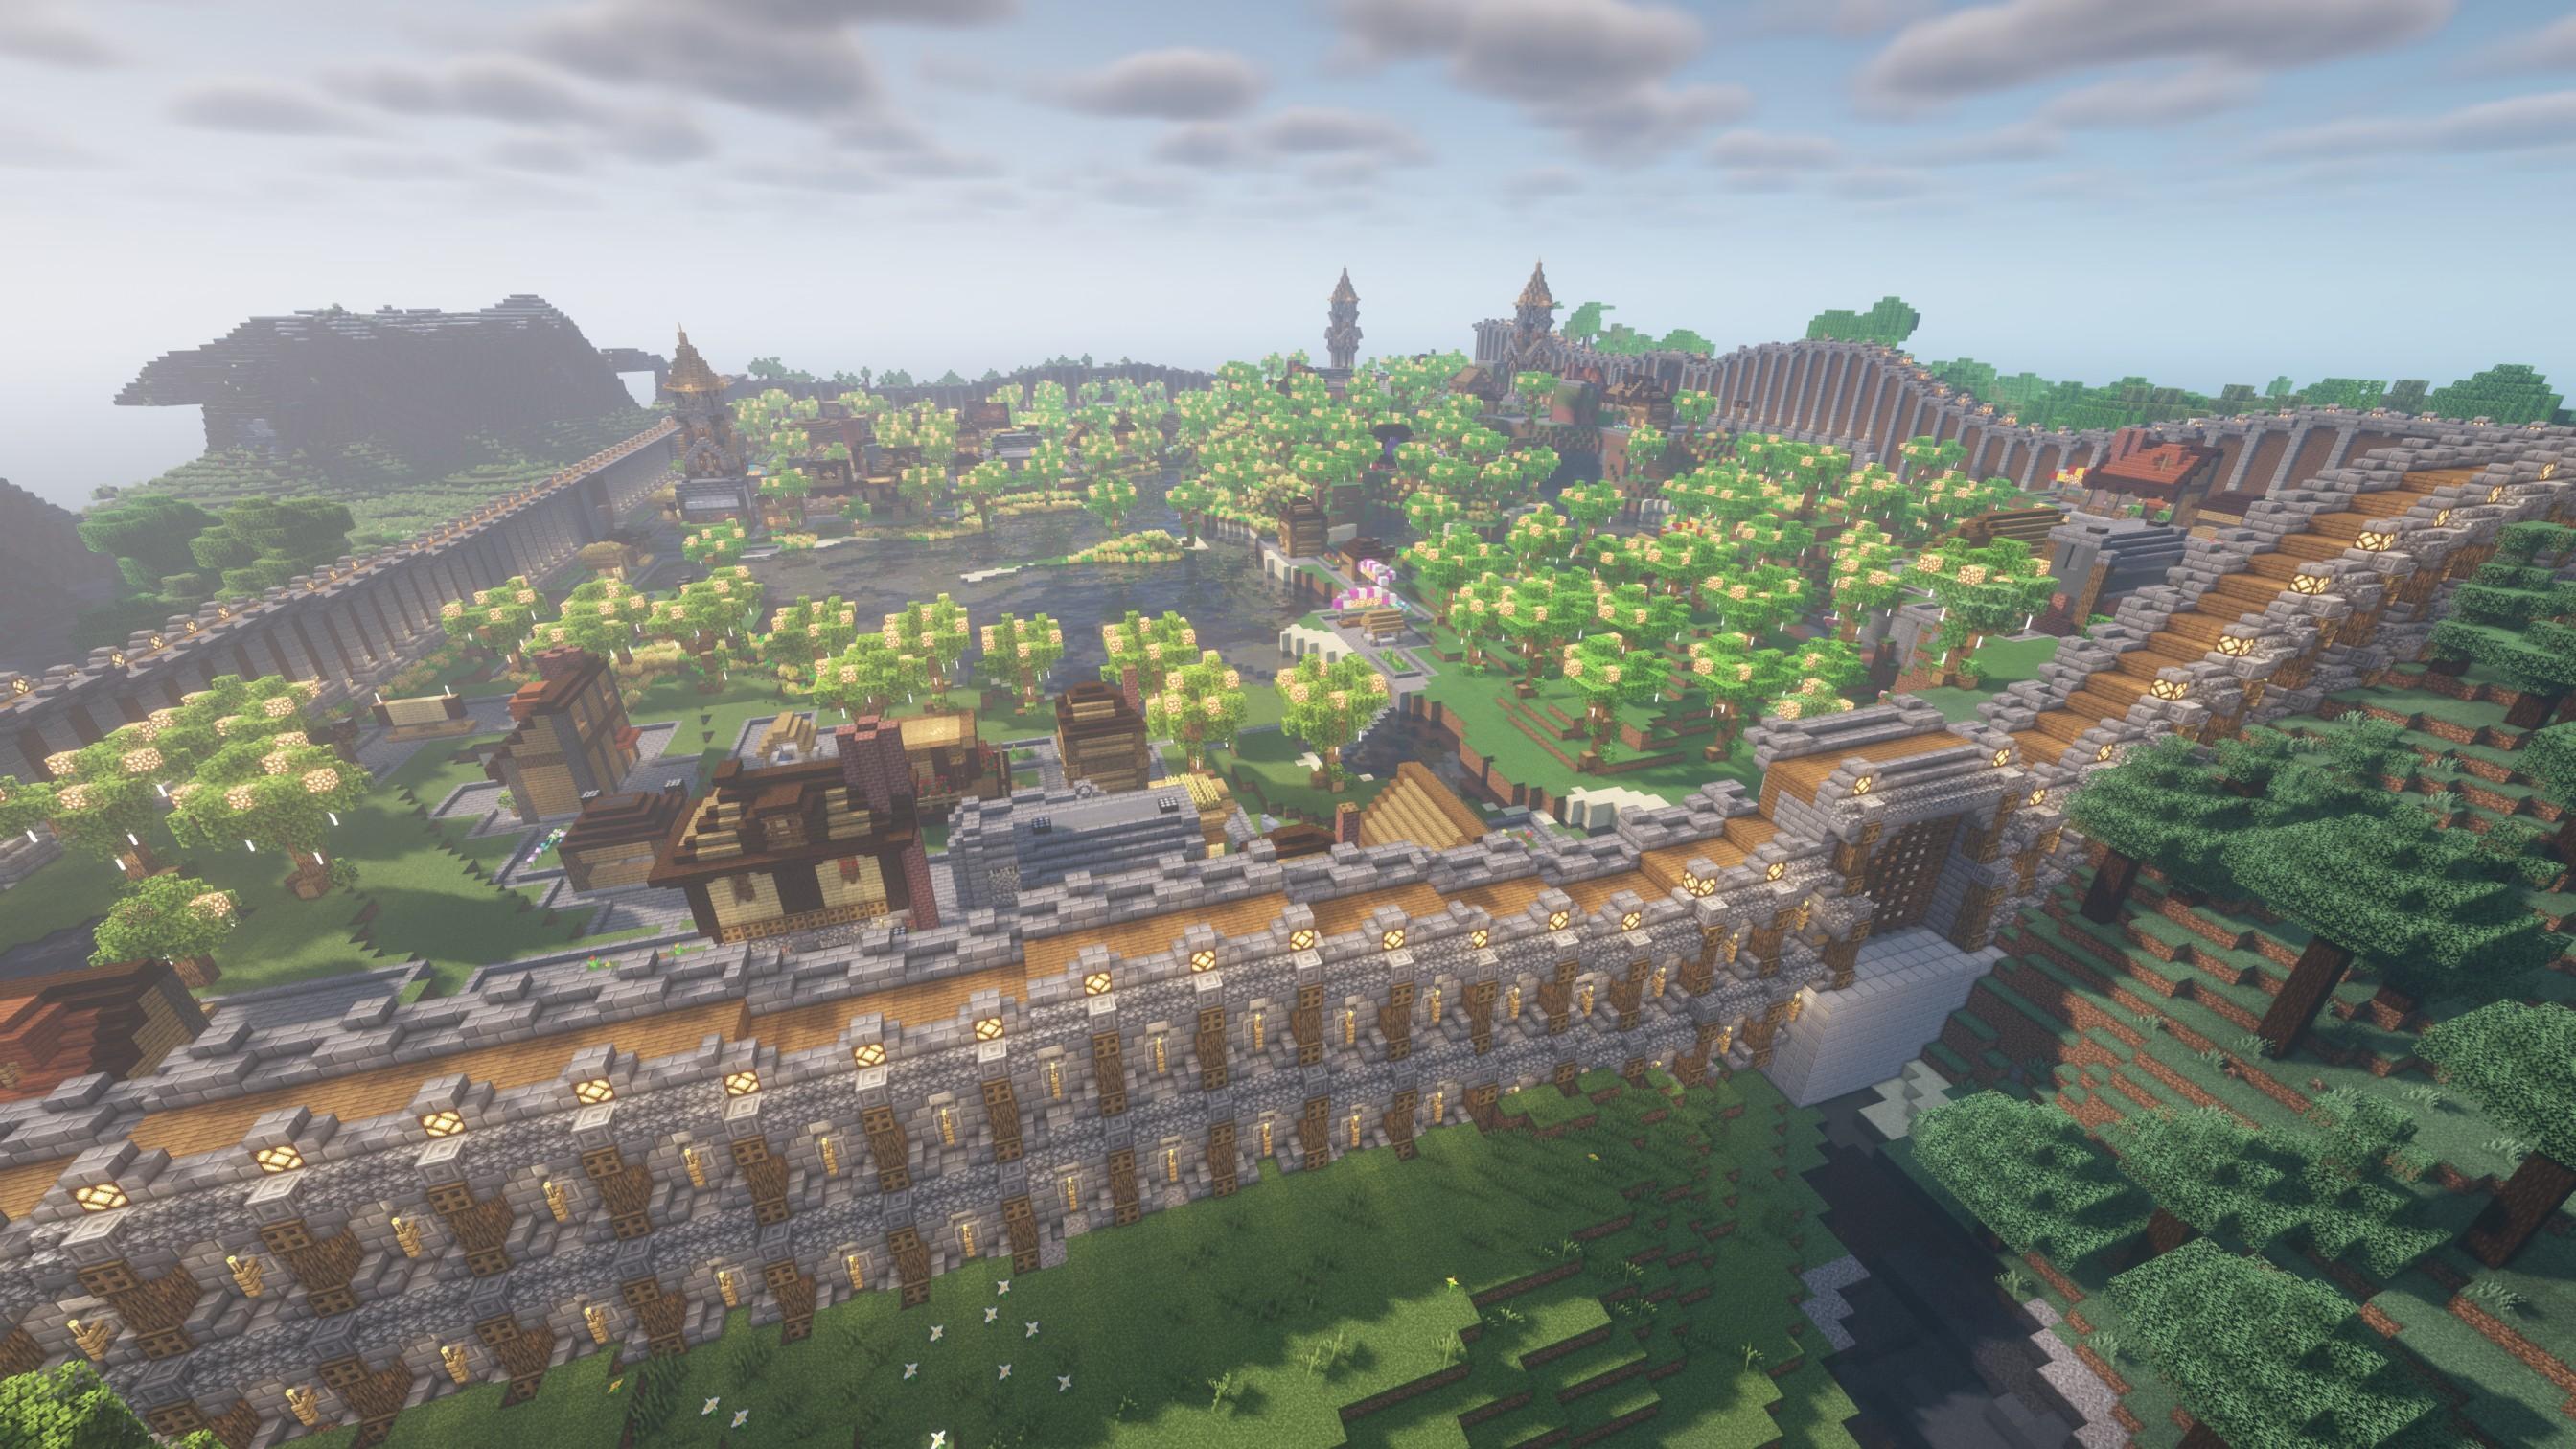 Image of minecraft settlement